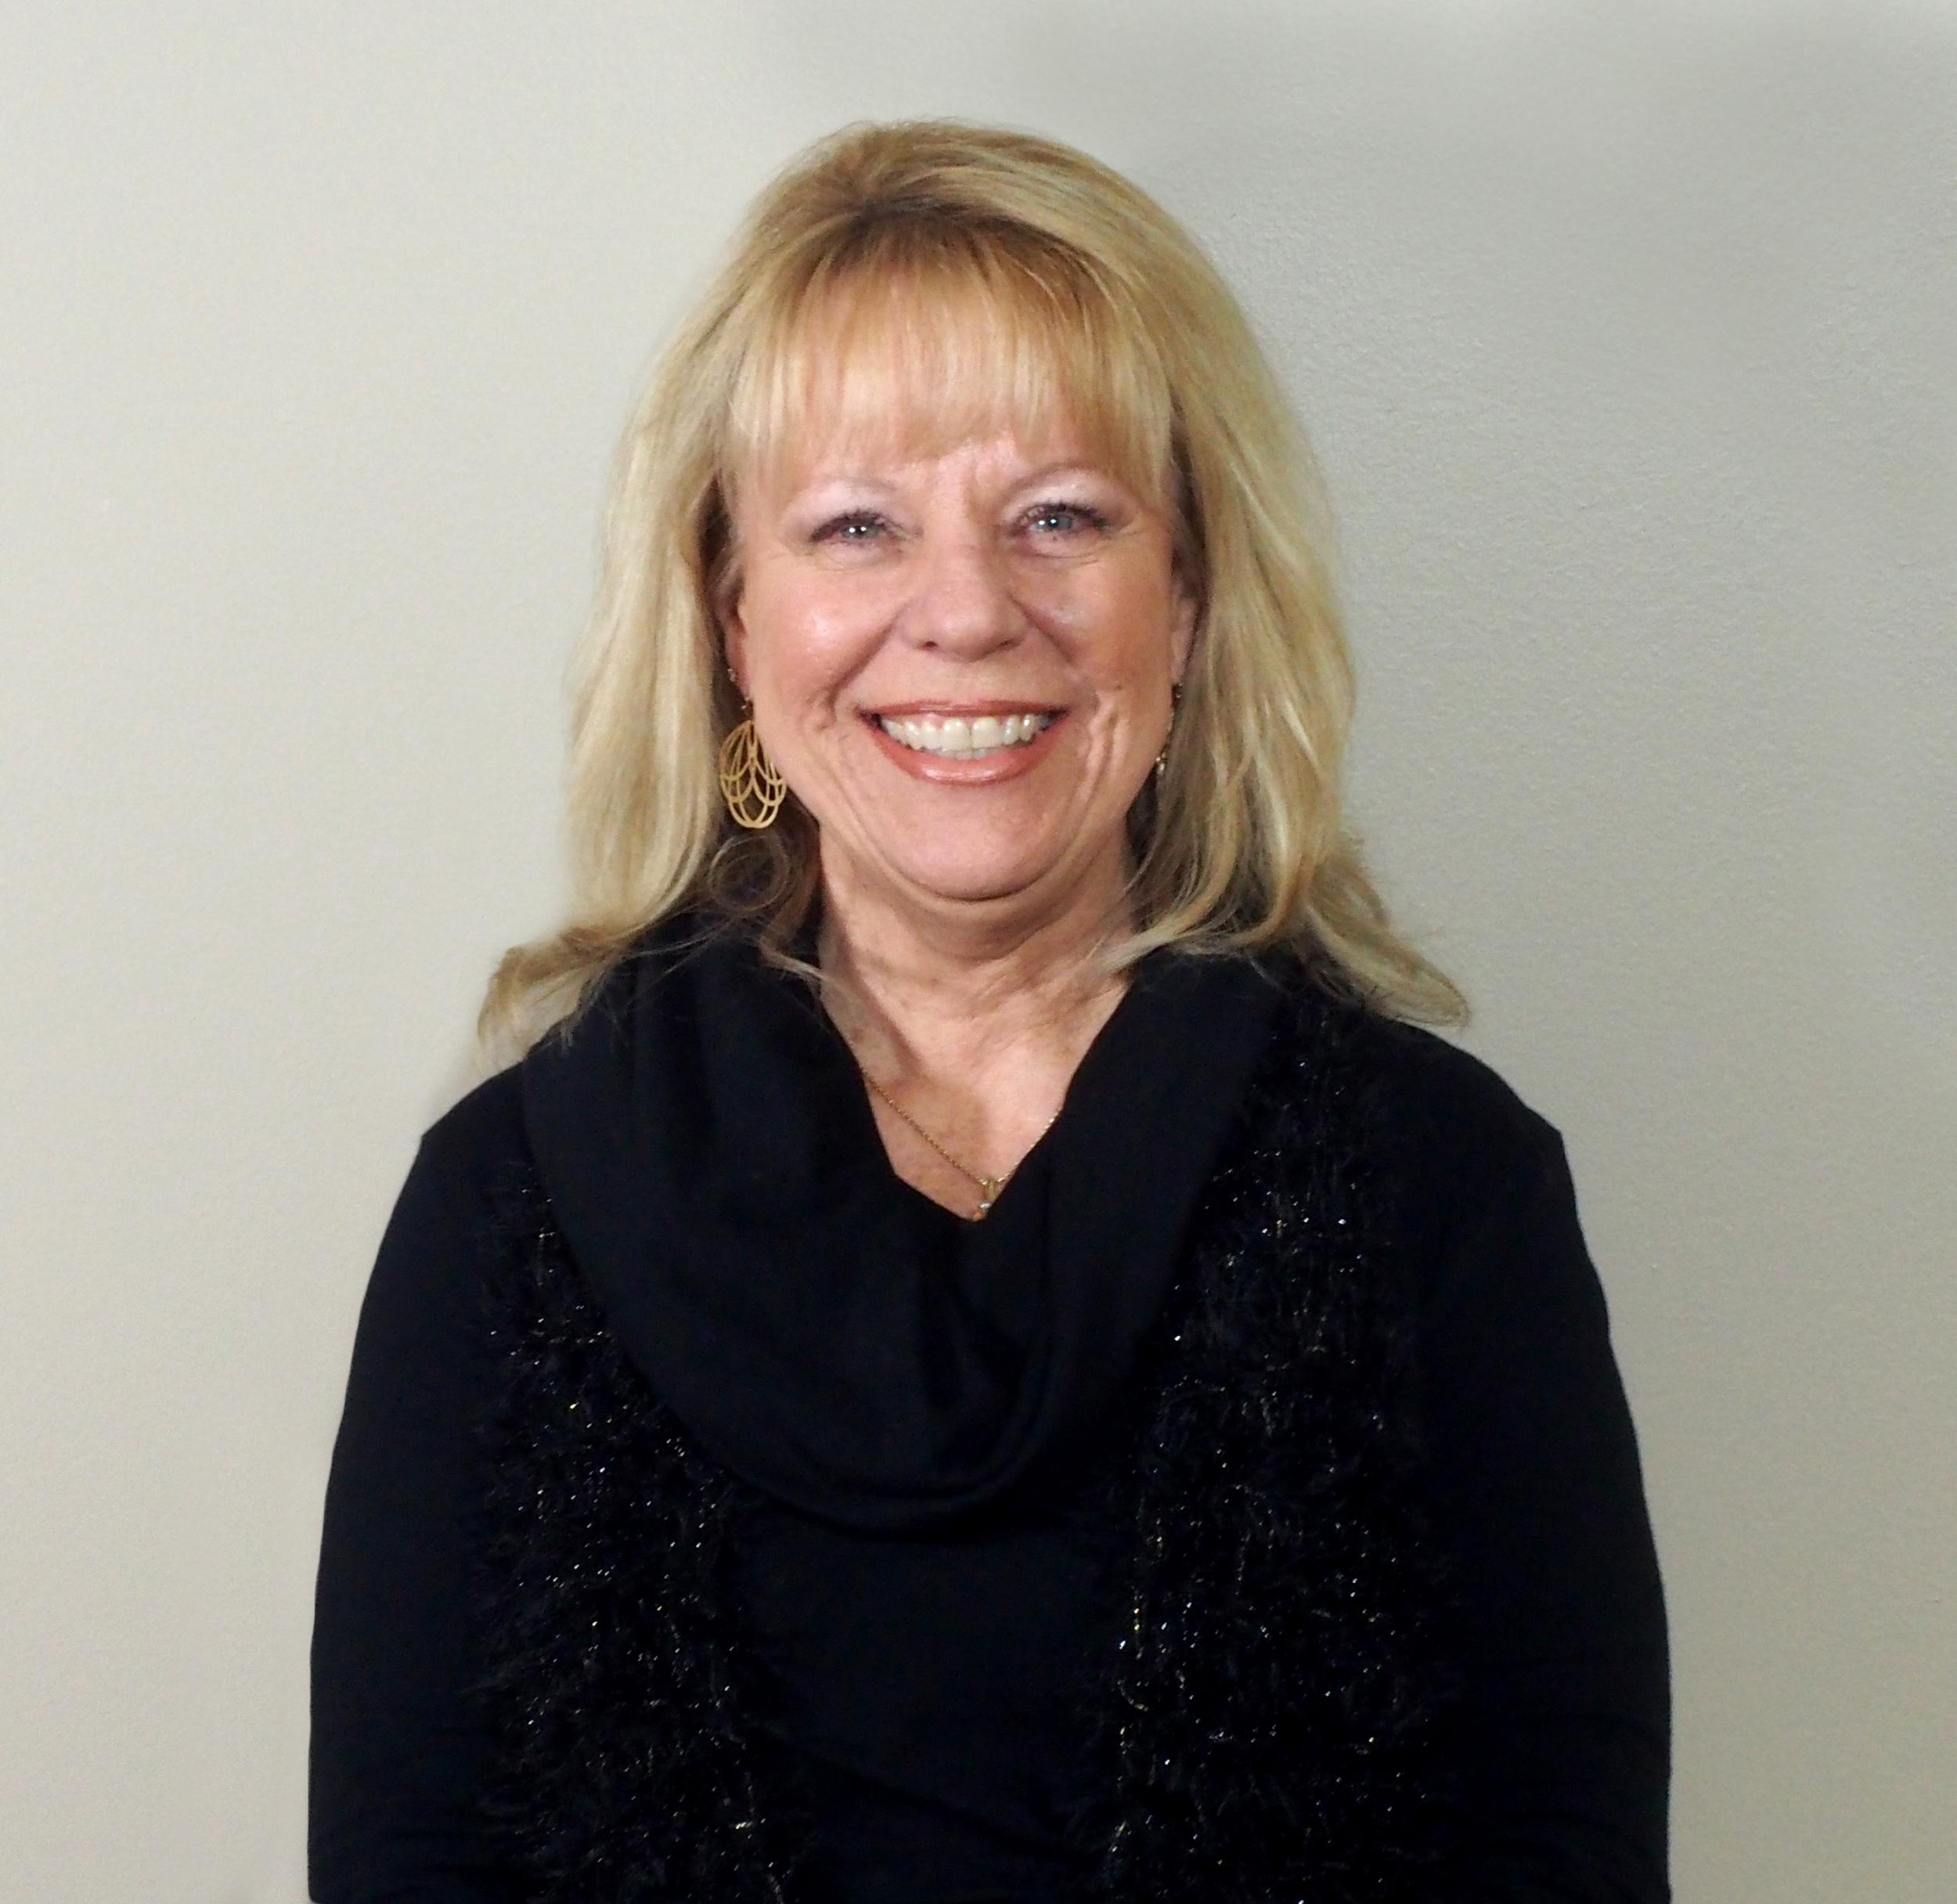 Cindy Foster - Controller / Accounts Payable